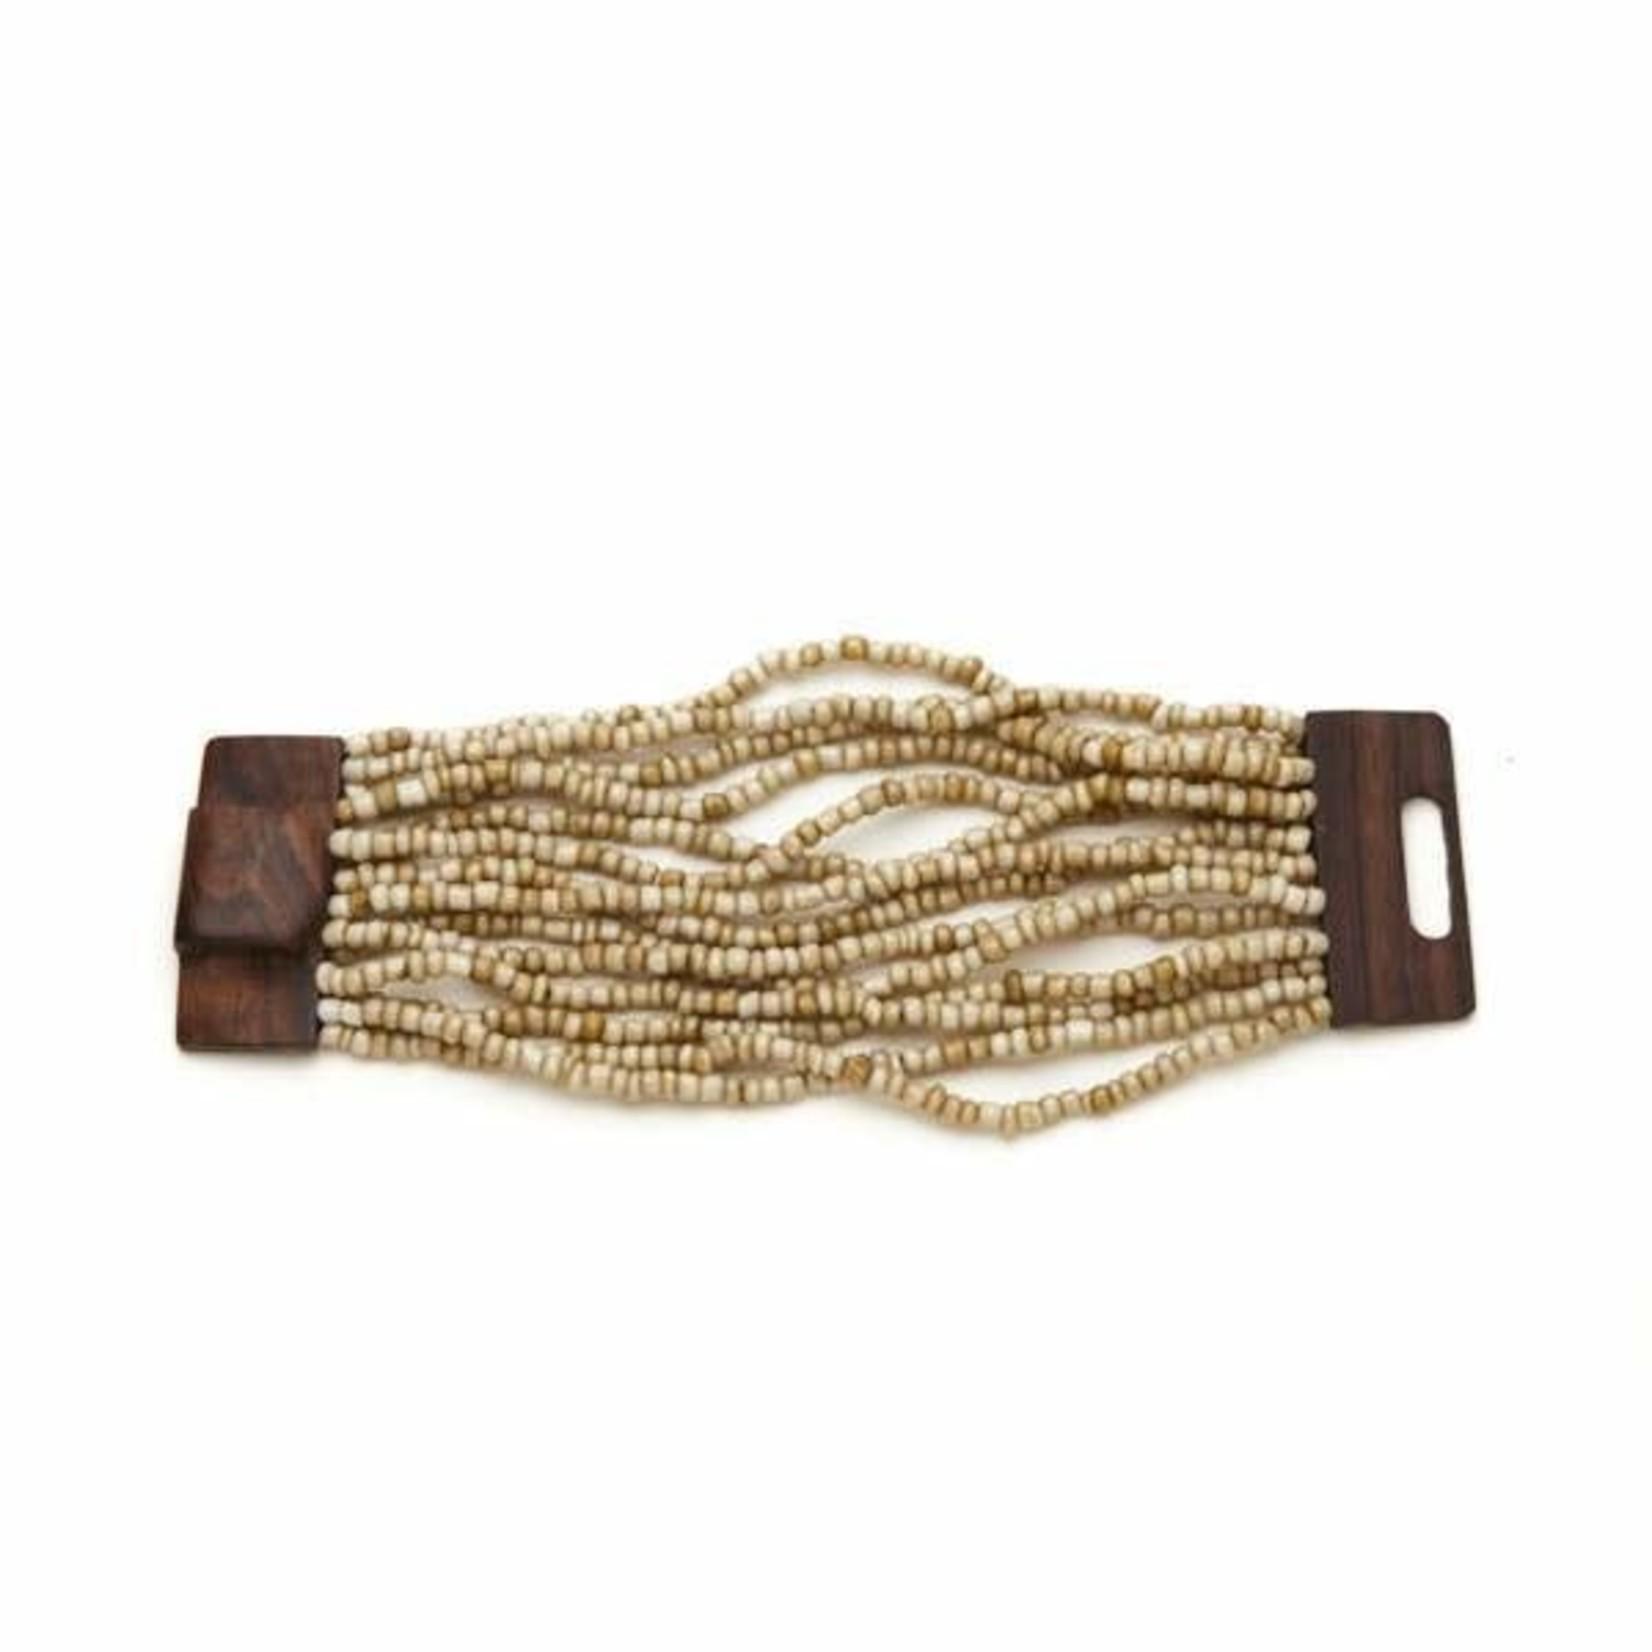 Suzie Blue Canada Multi-strand Bracelet w/ Wooden Clasp in Cream